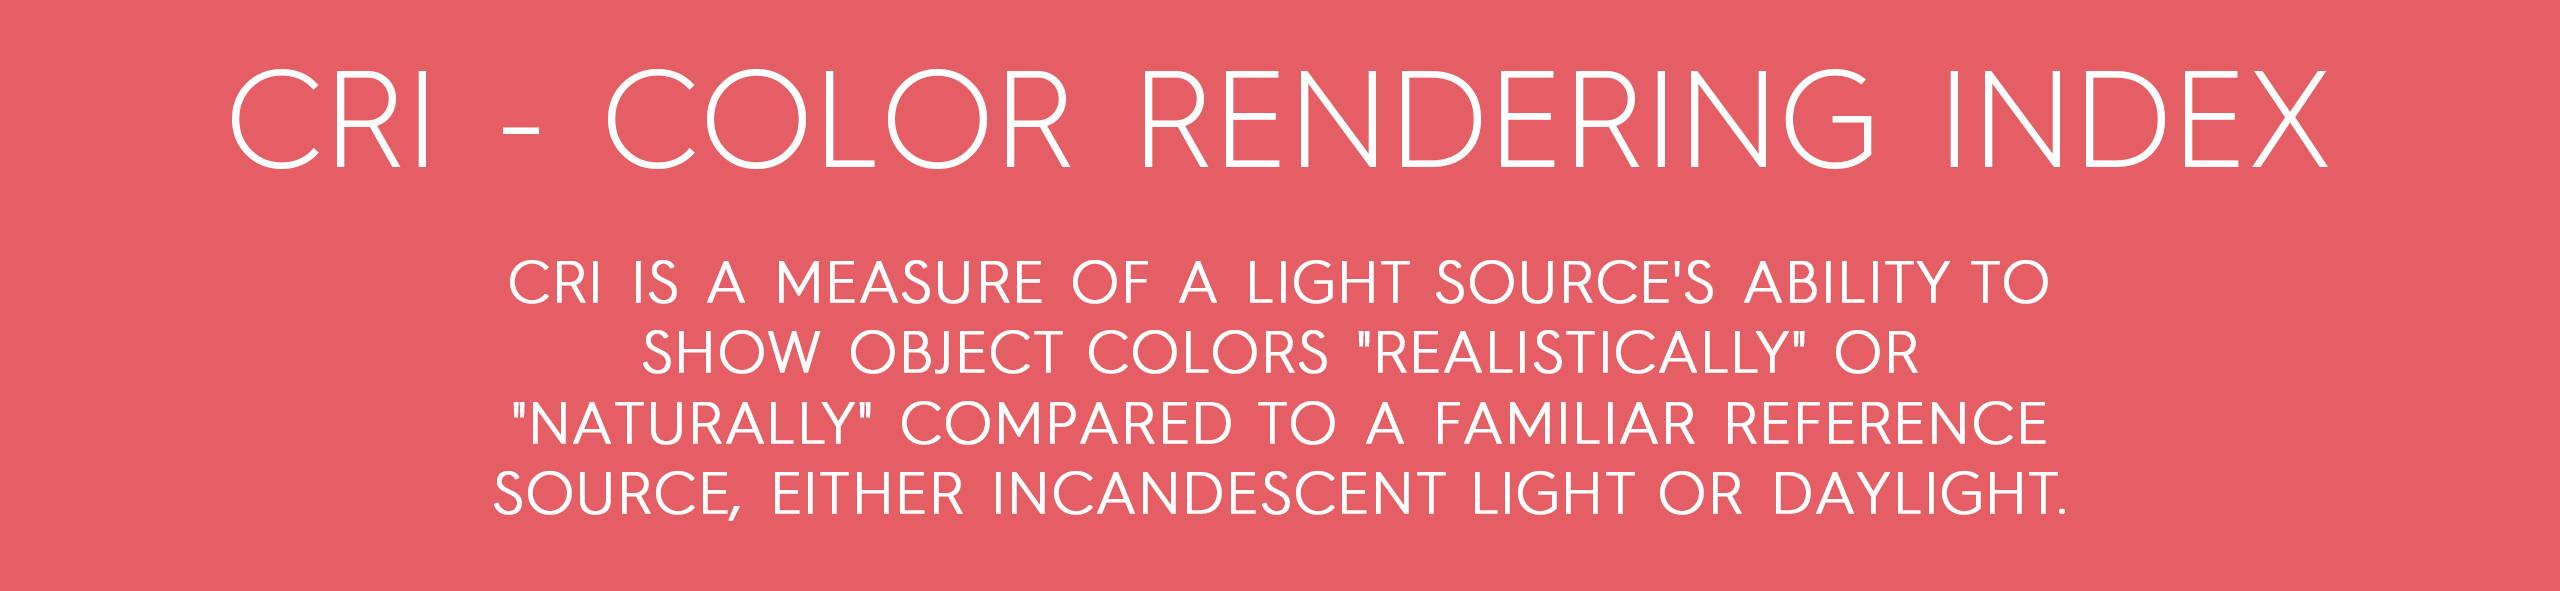 explanation of color rendering index from rikilovesriki